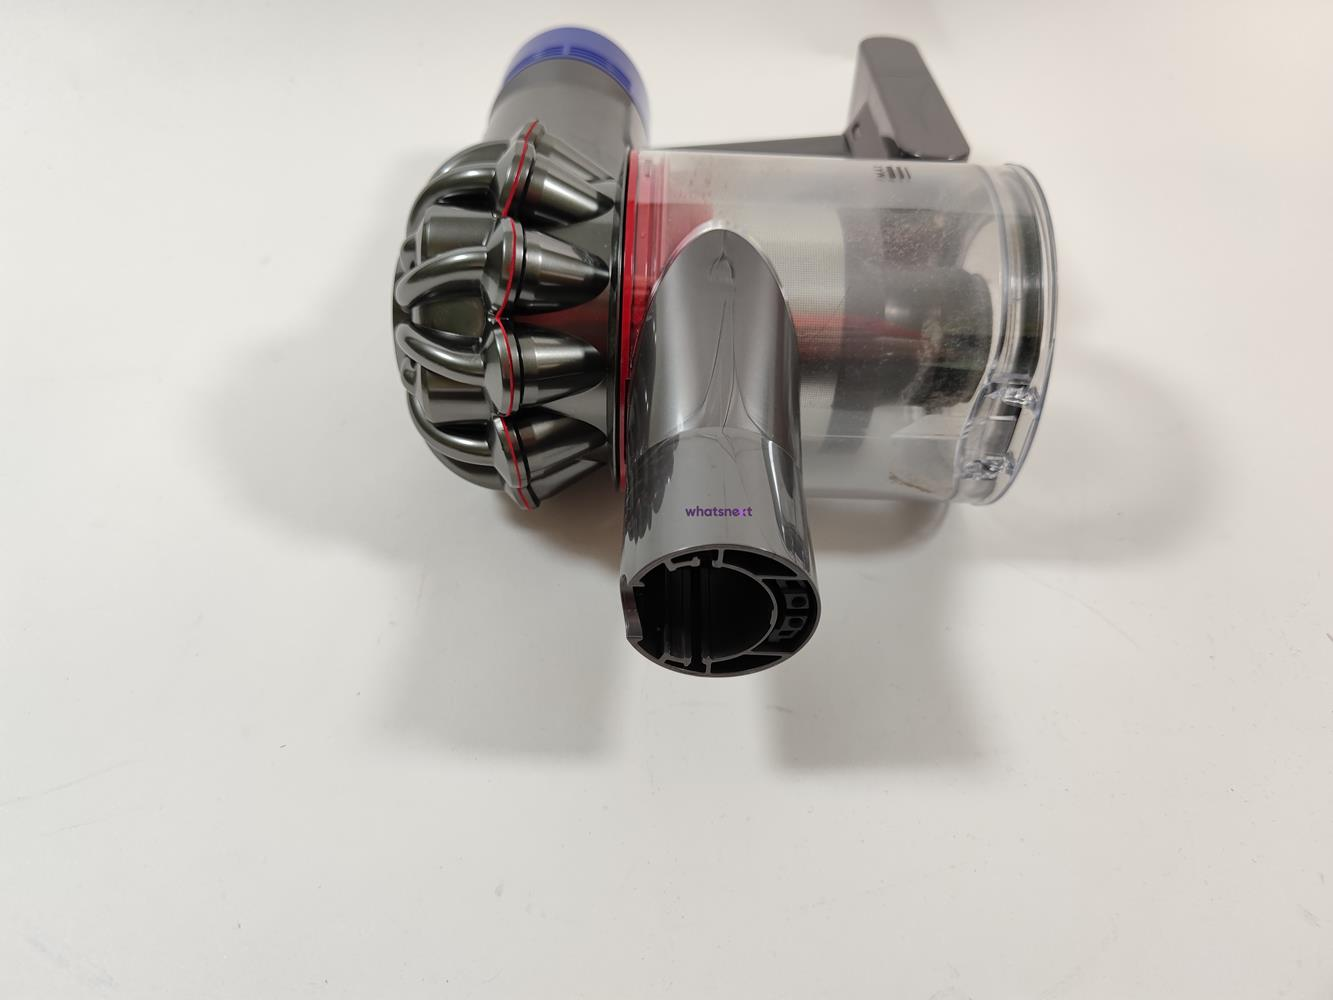 test Dyson V8 Abolute, recenzja Dyson V8 Abolute, opinia Dyson V8 Abolute